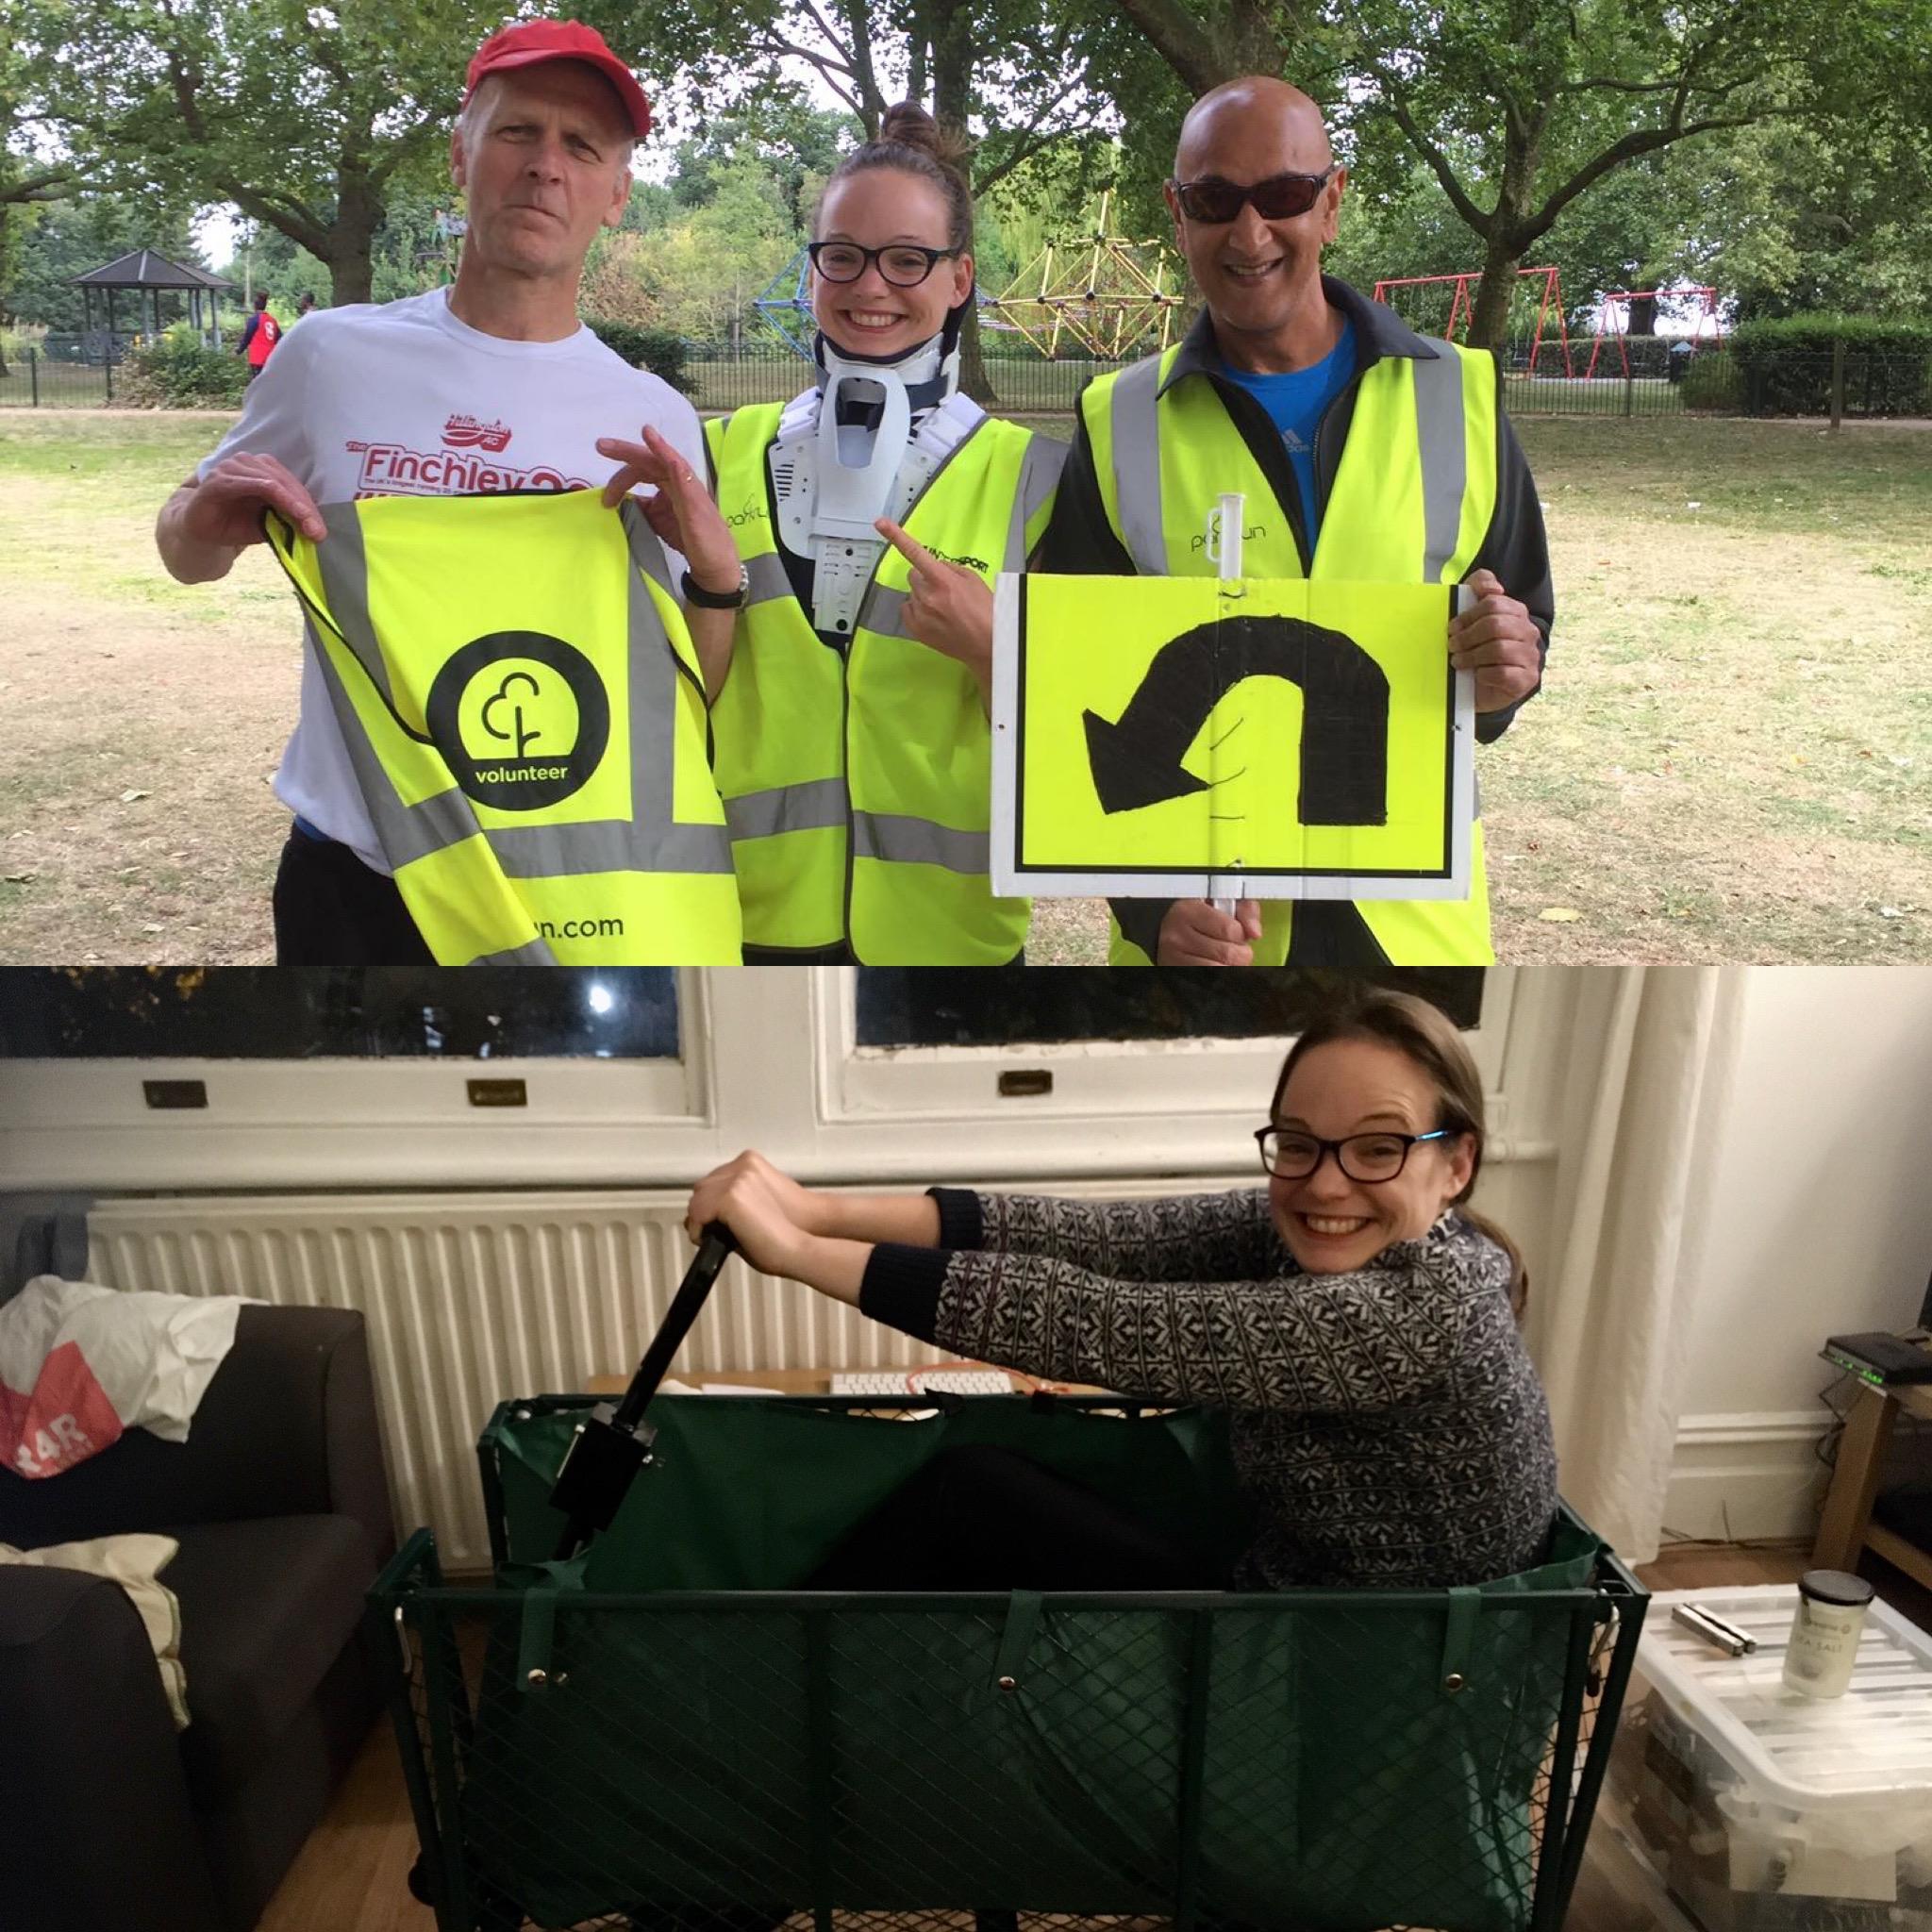 Volunteering collage